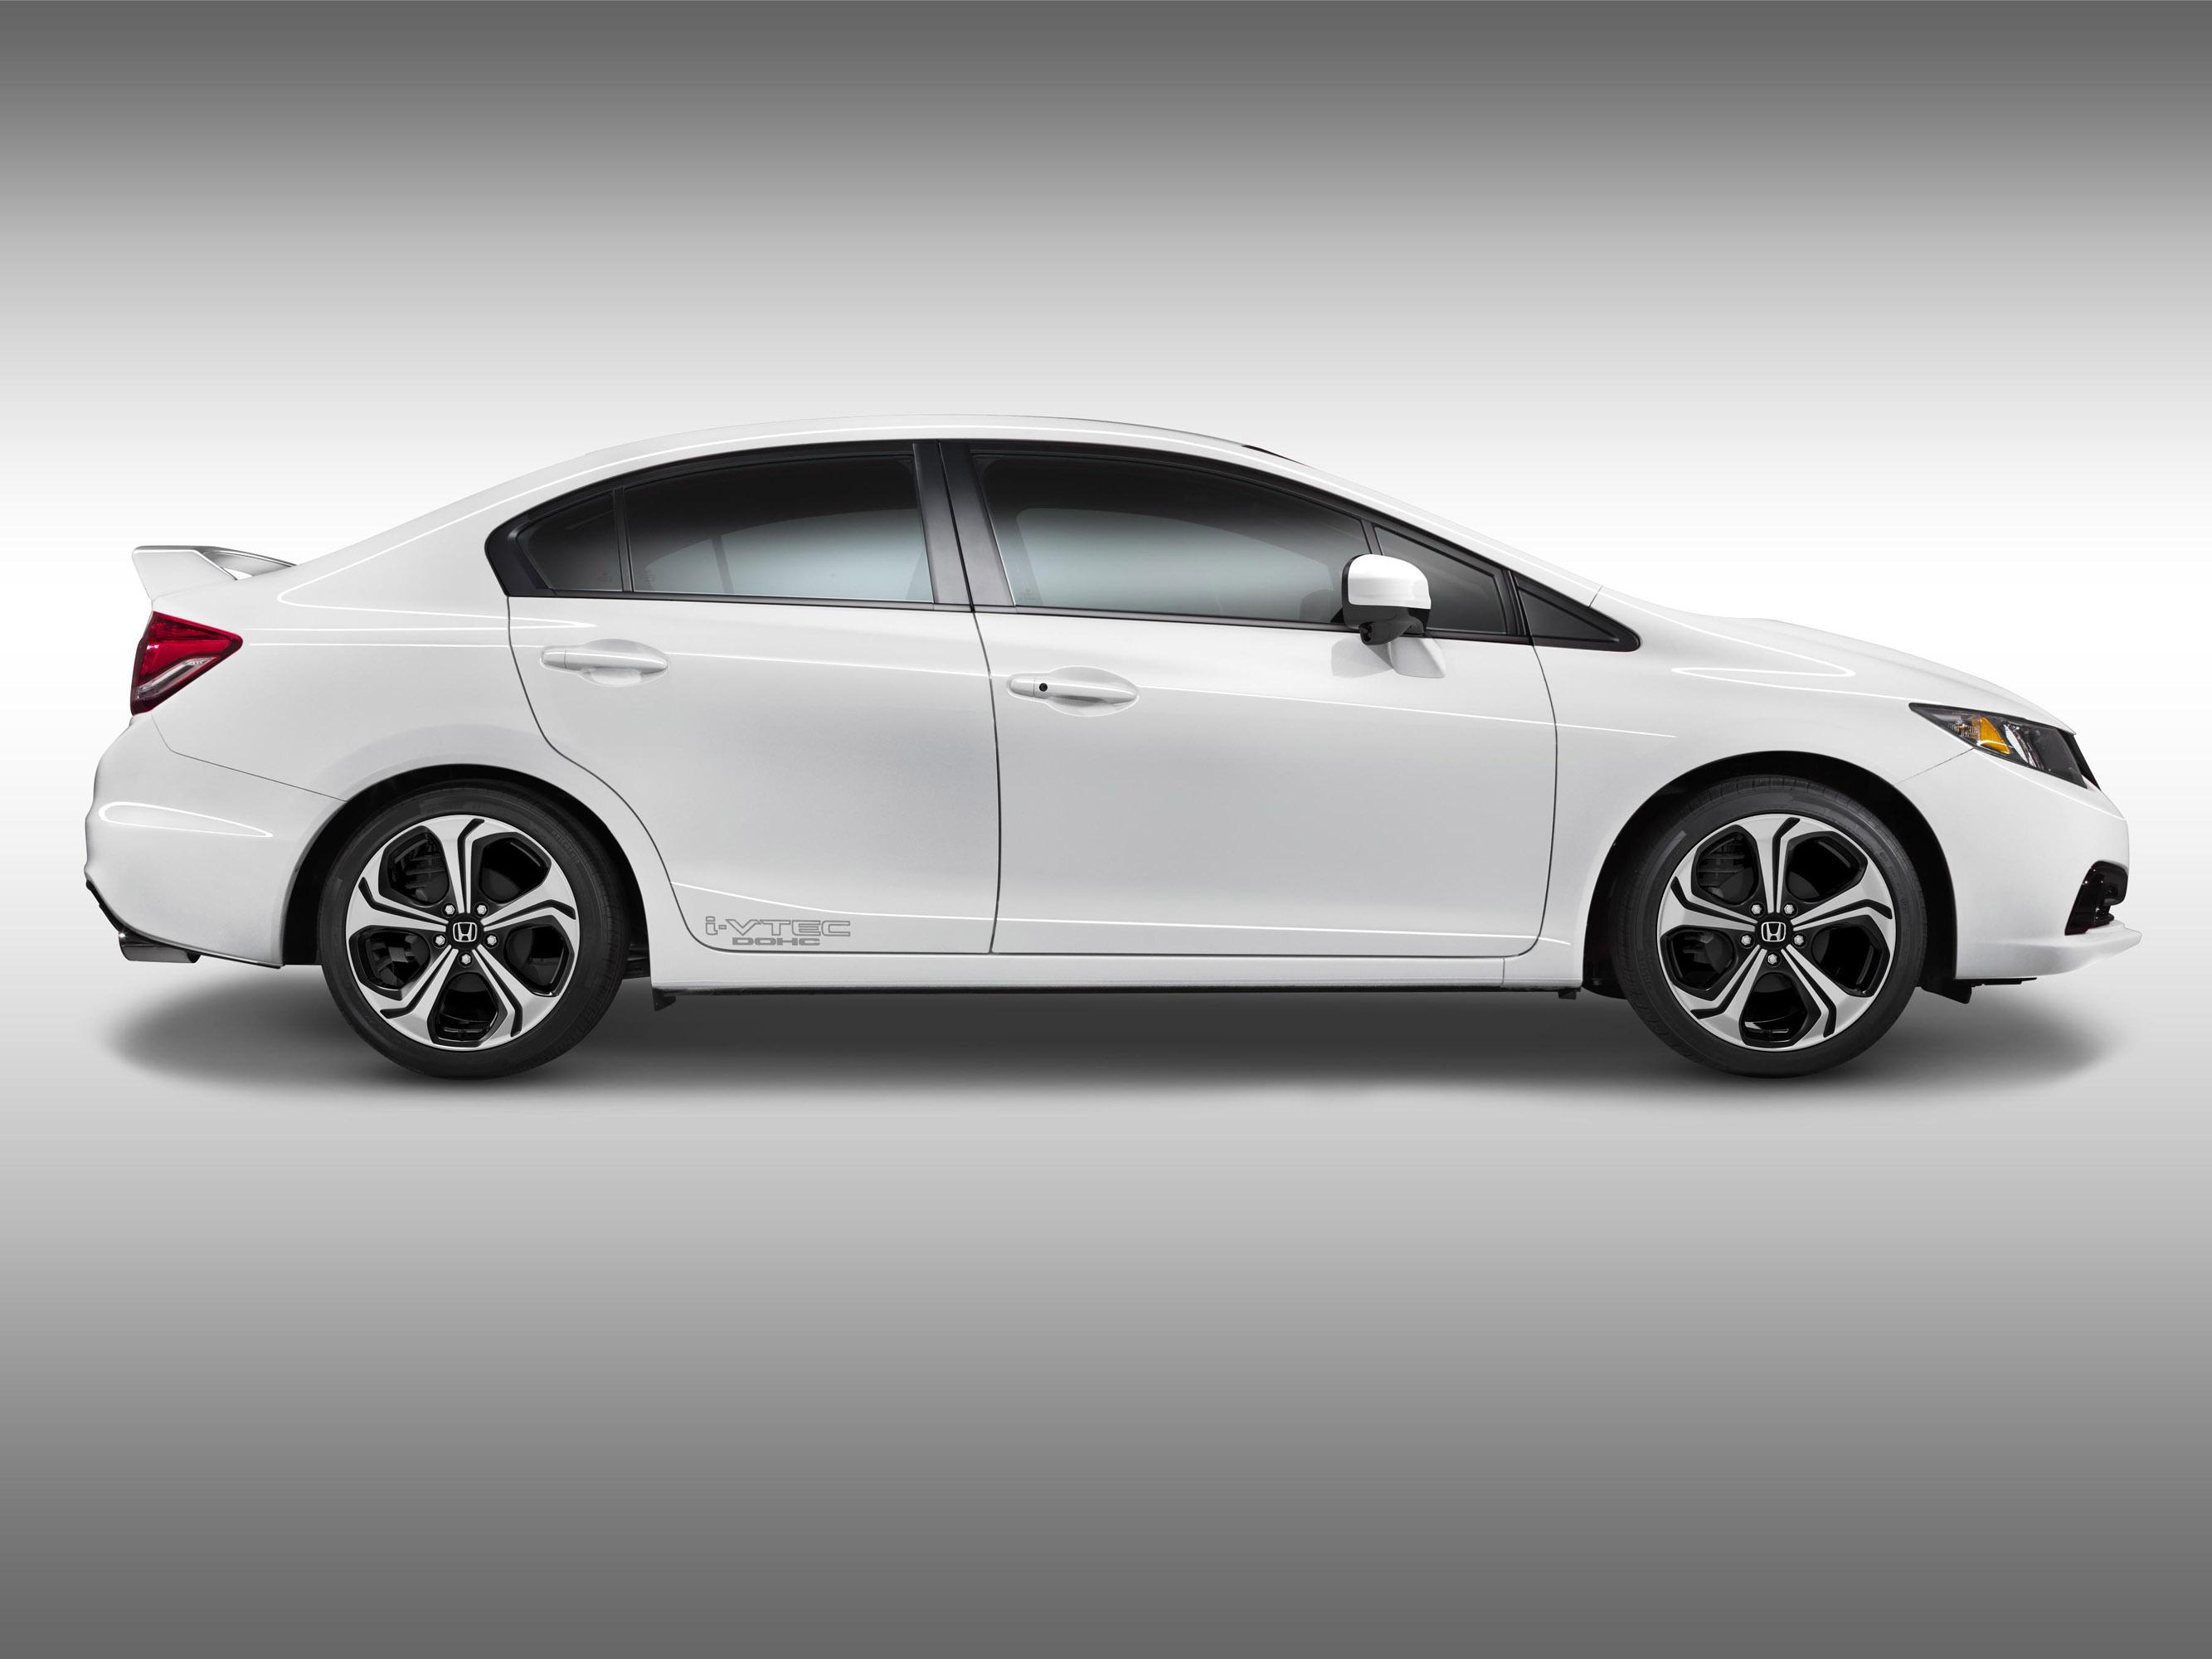 news concept ex conceptii breaking car lx leaked civic honda the information model sedan